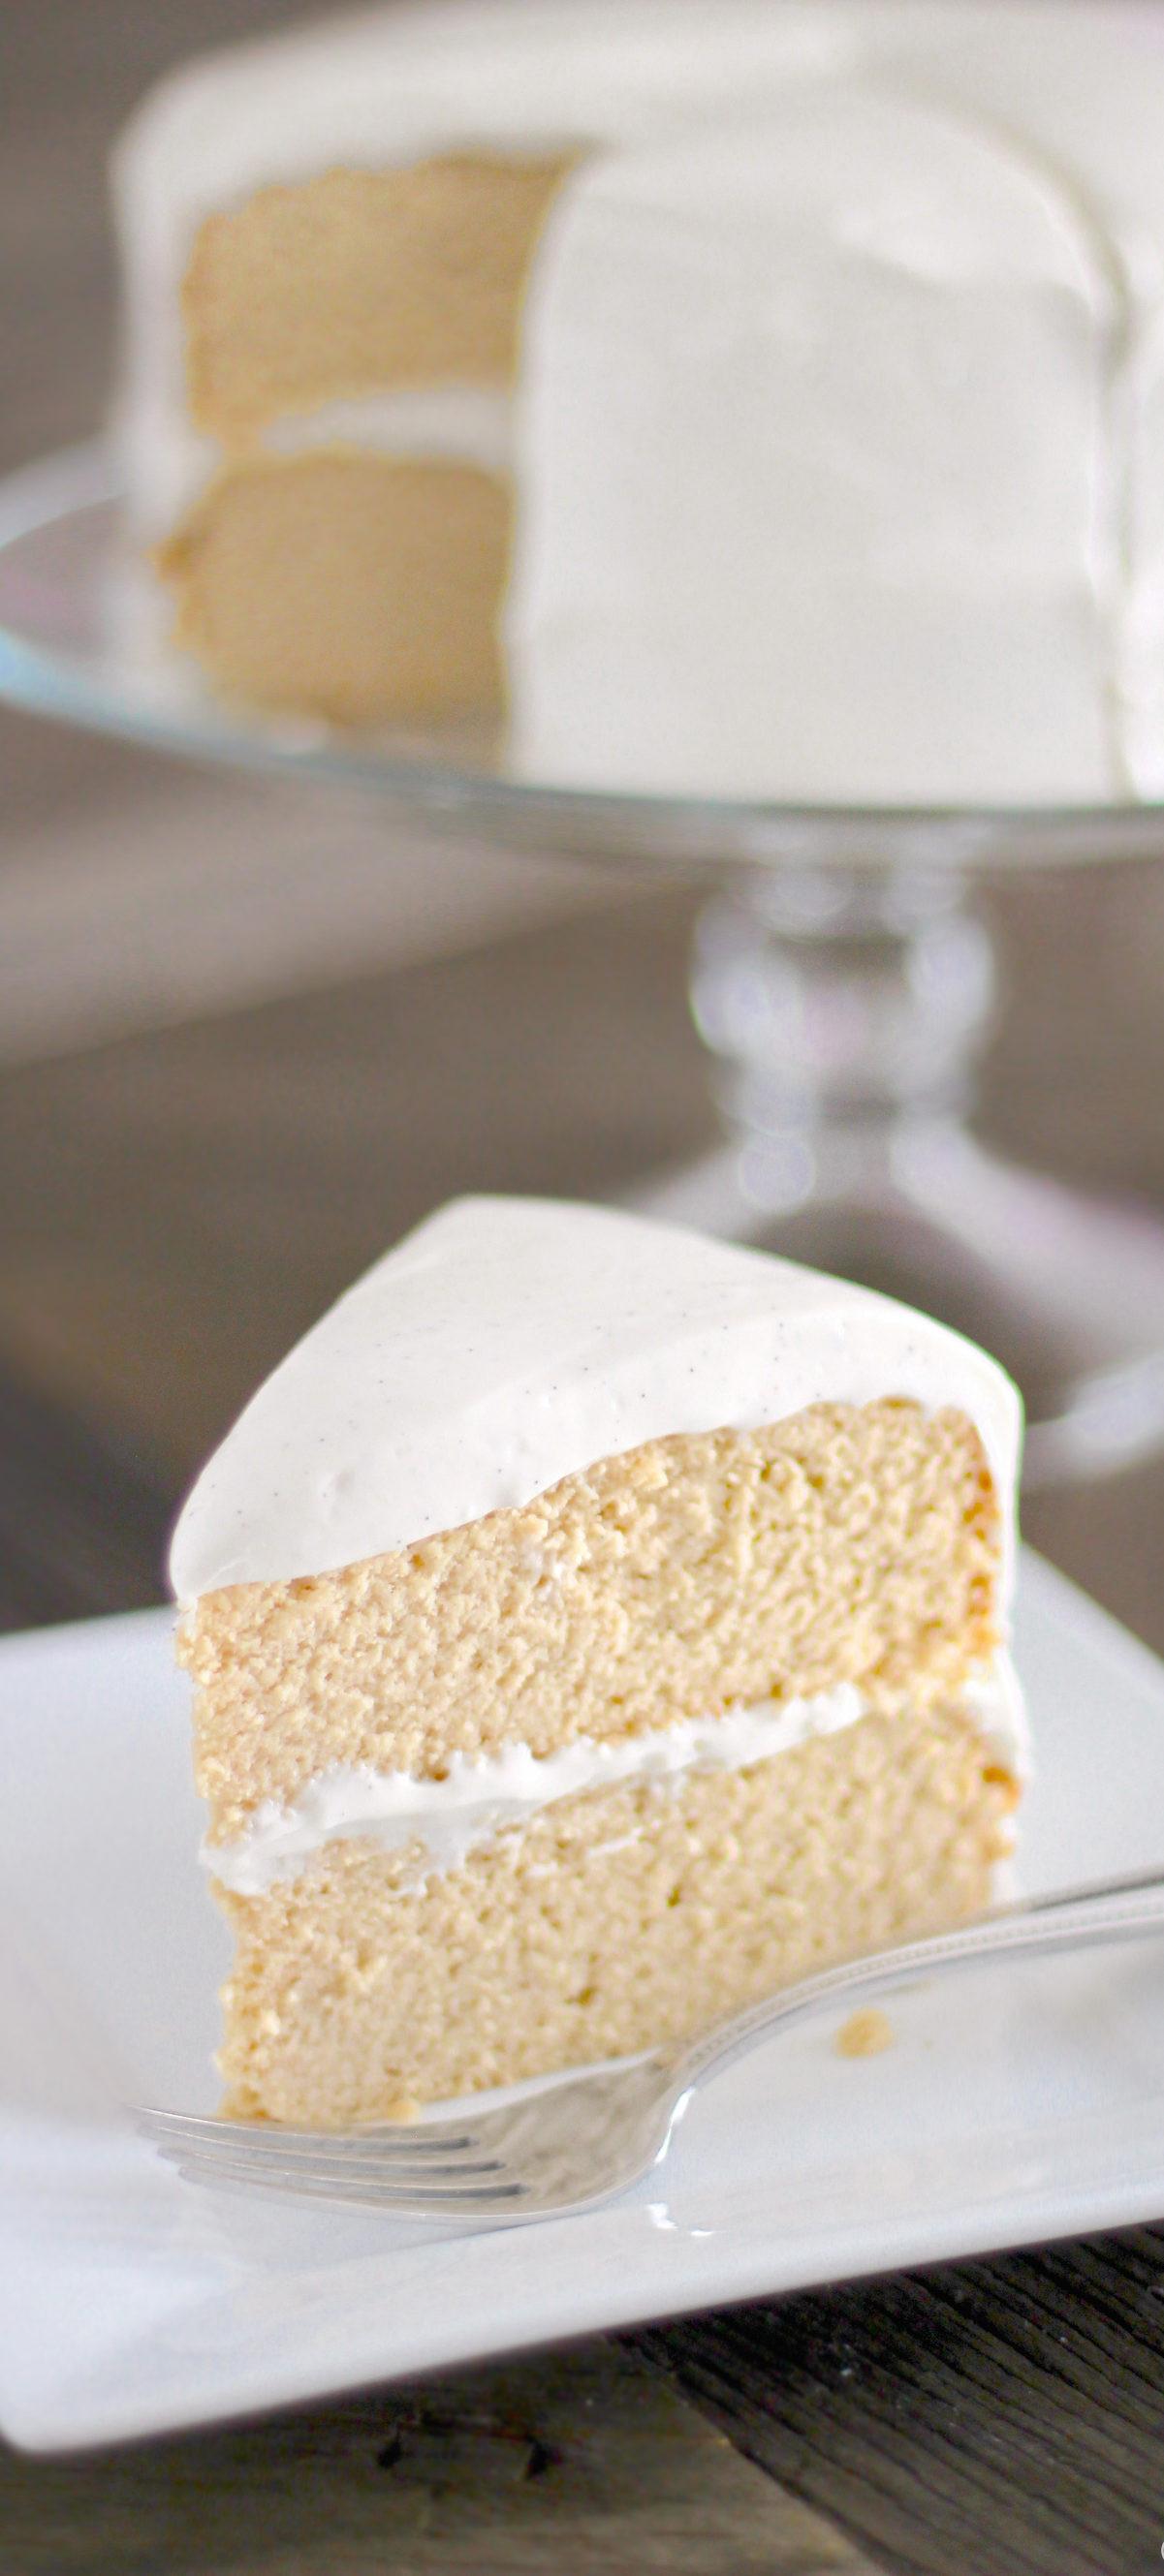 Low Carb Cream Cheese Dessert Recipes  The lightest fluffiest Gluten Free Vanilla Cake Recipe